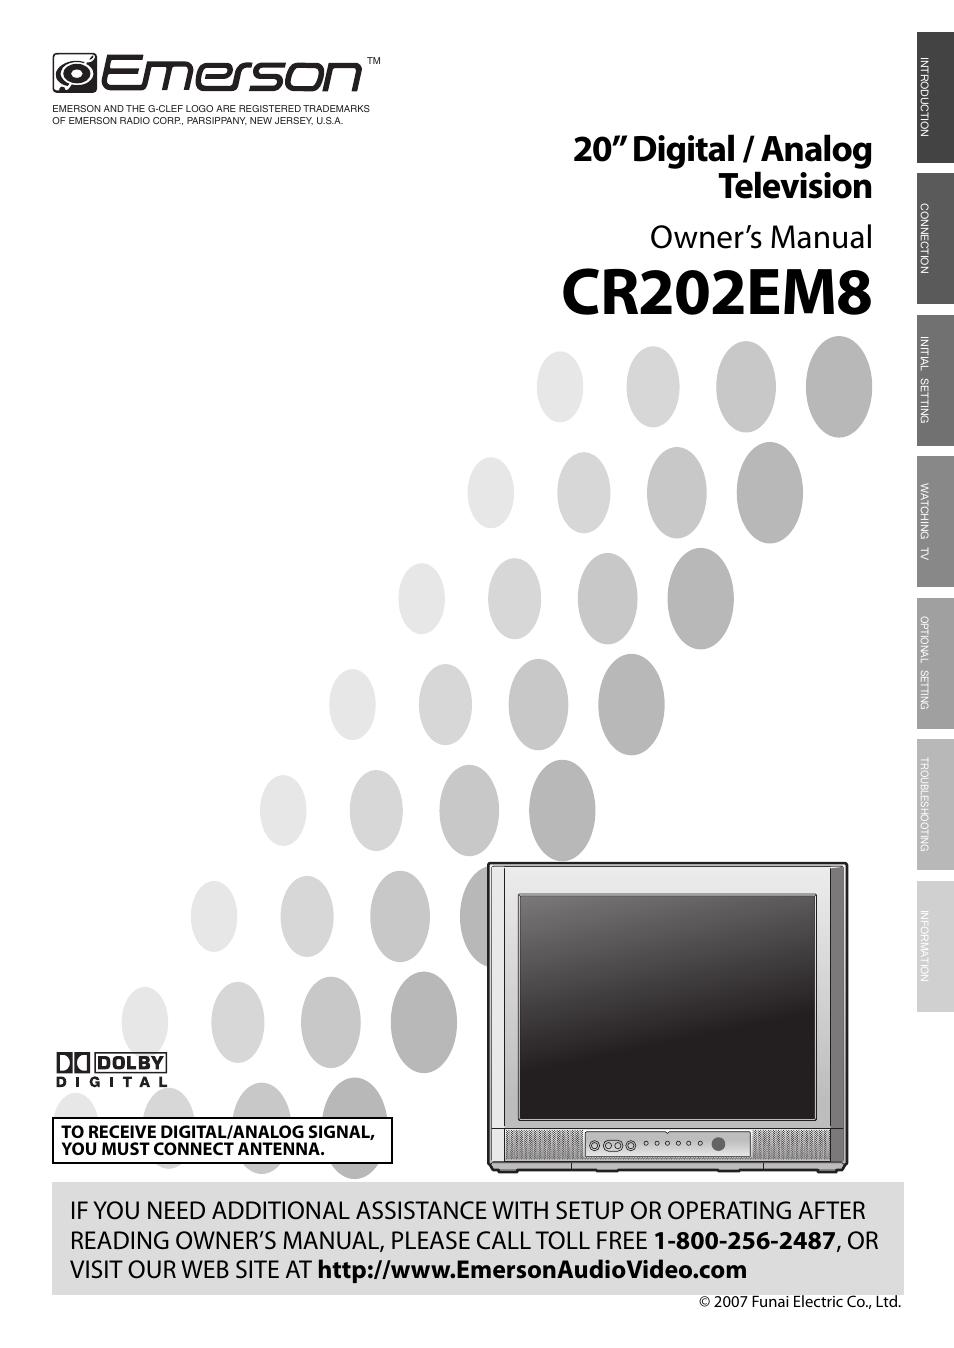 emerson cr202em8 user manual 52 pages rh manualsdir com emerson tv user guide emerson tv ltdn42v68us owners manual